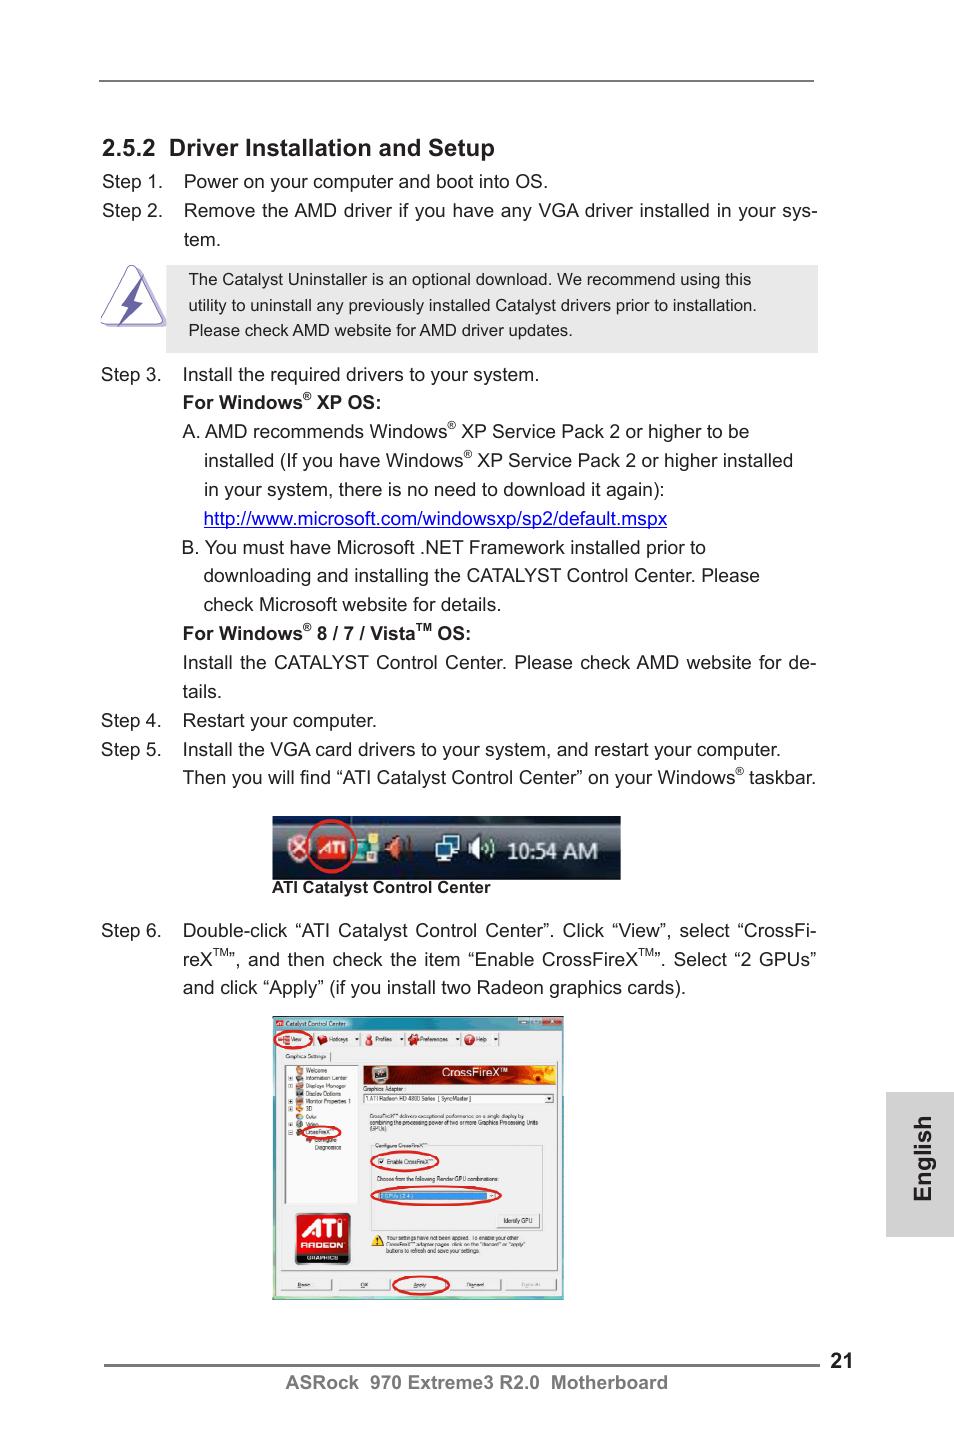 Updating the amd ati radeon hd 4600 and ati firegl v7700 graphics.